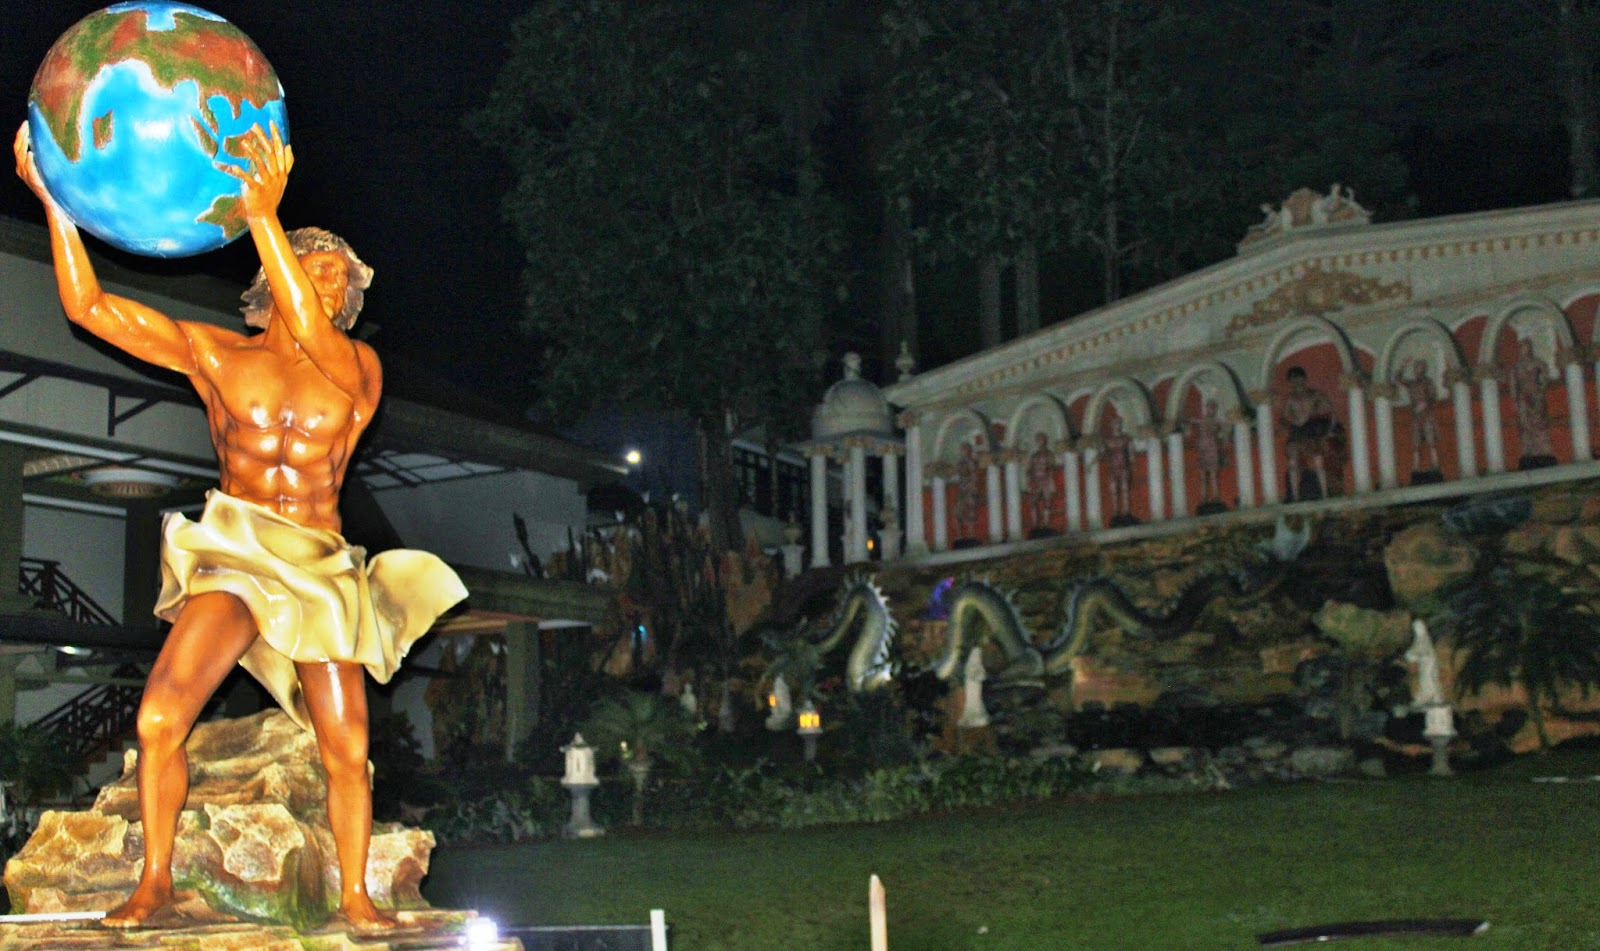 paket wisata bogor sukabumi,travel bogor robinson villa resort puncak, tour and travel bogor, adventure bogor sukabumi